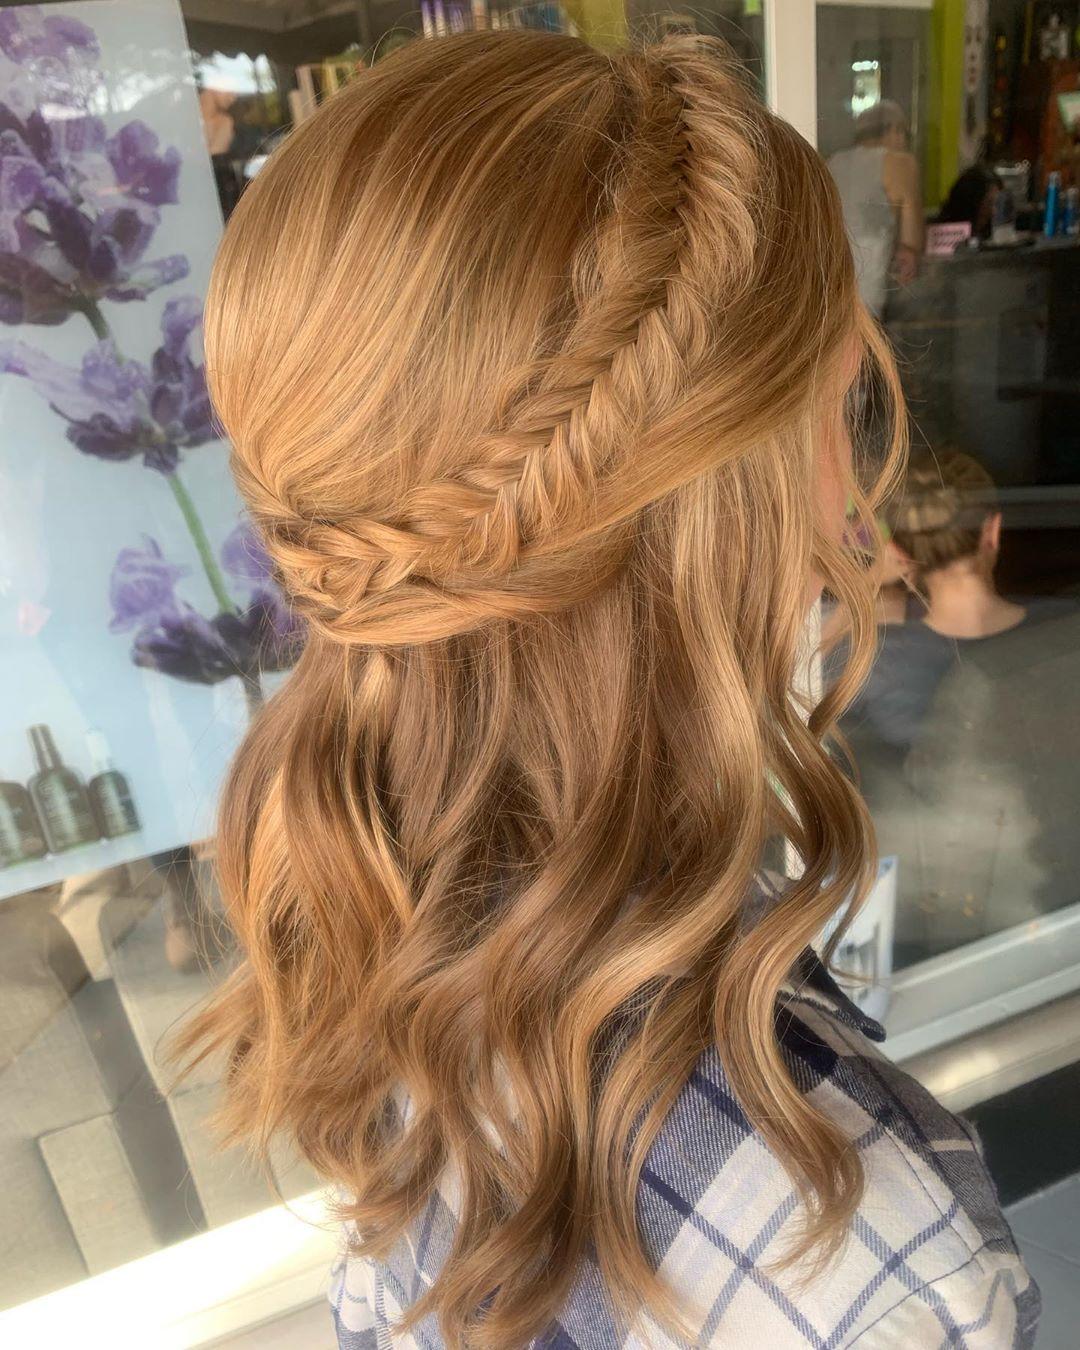 Halfback Crown Dutch Fishtail Braid Hairstyles